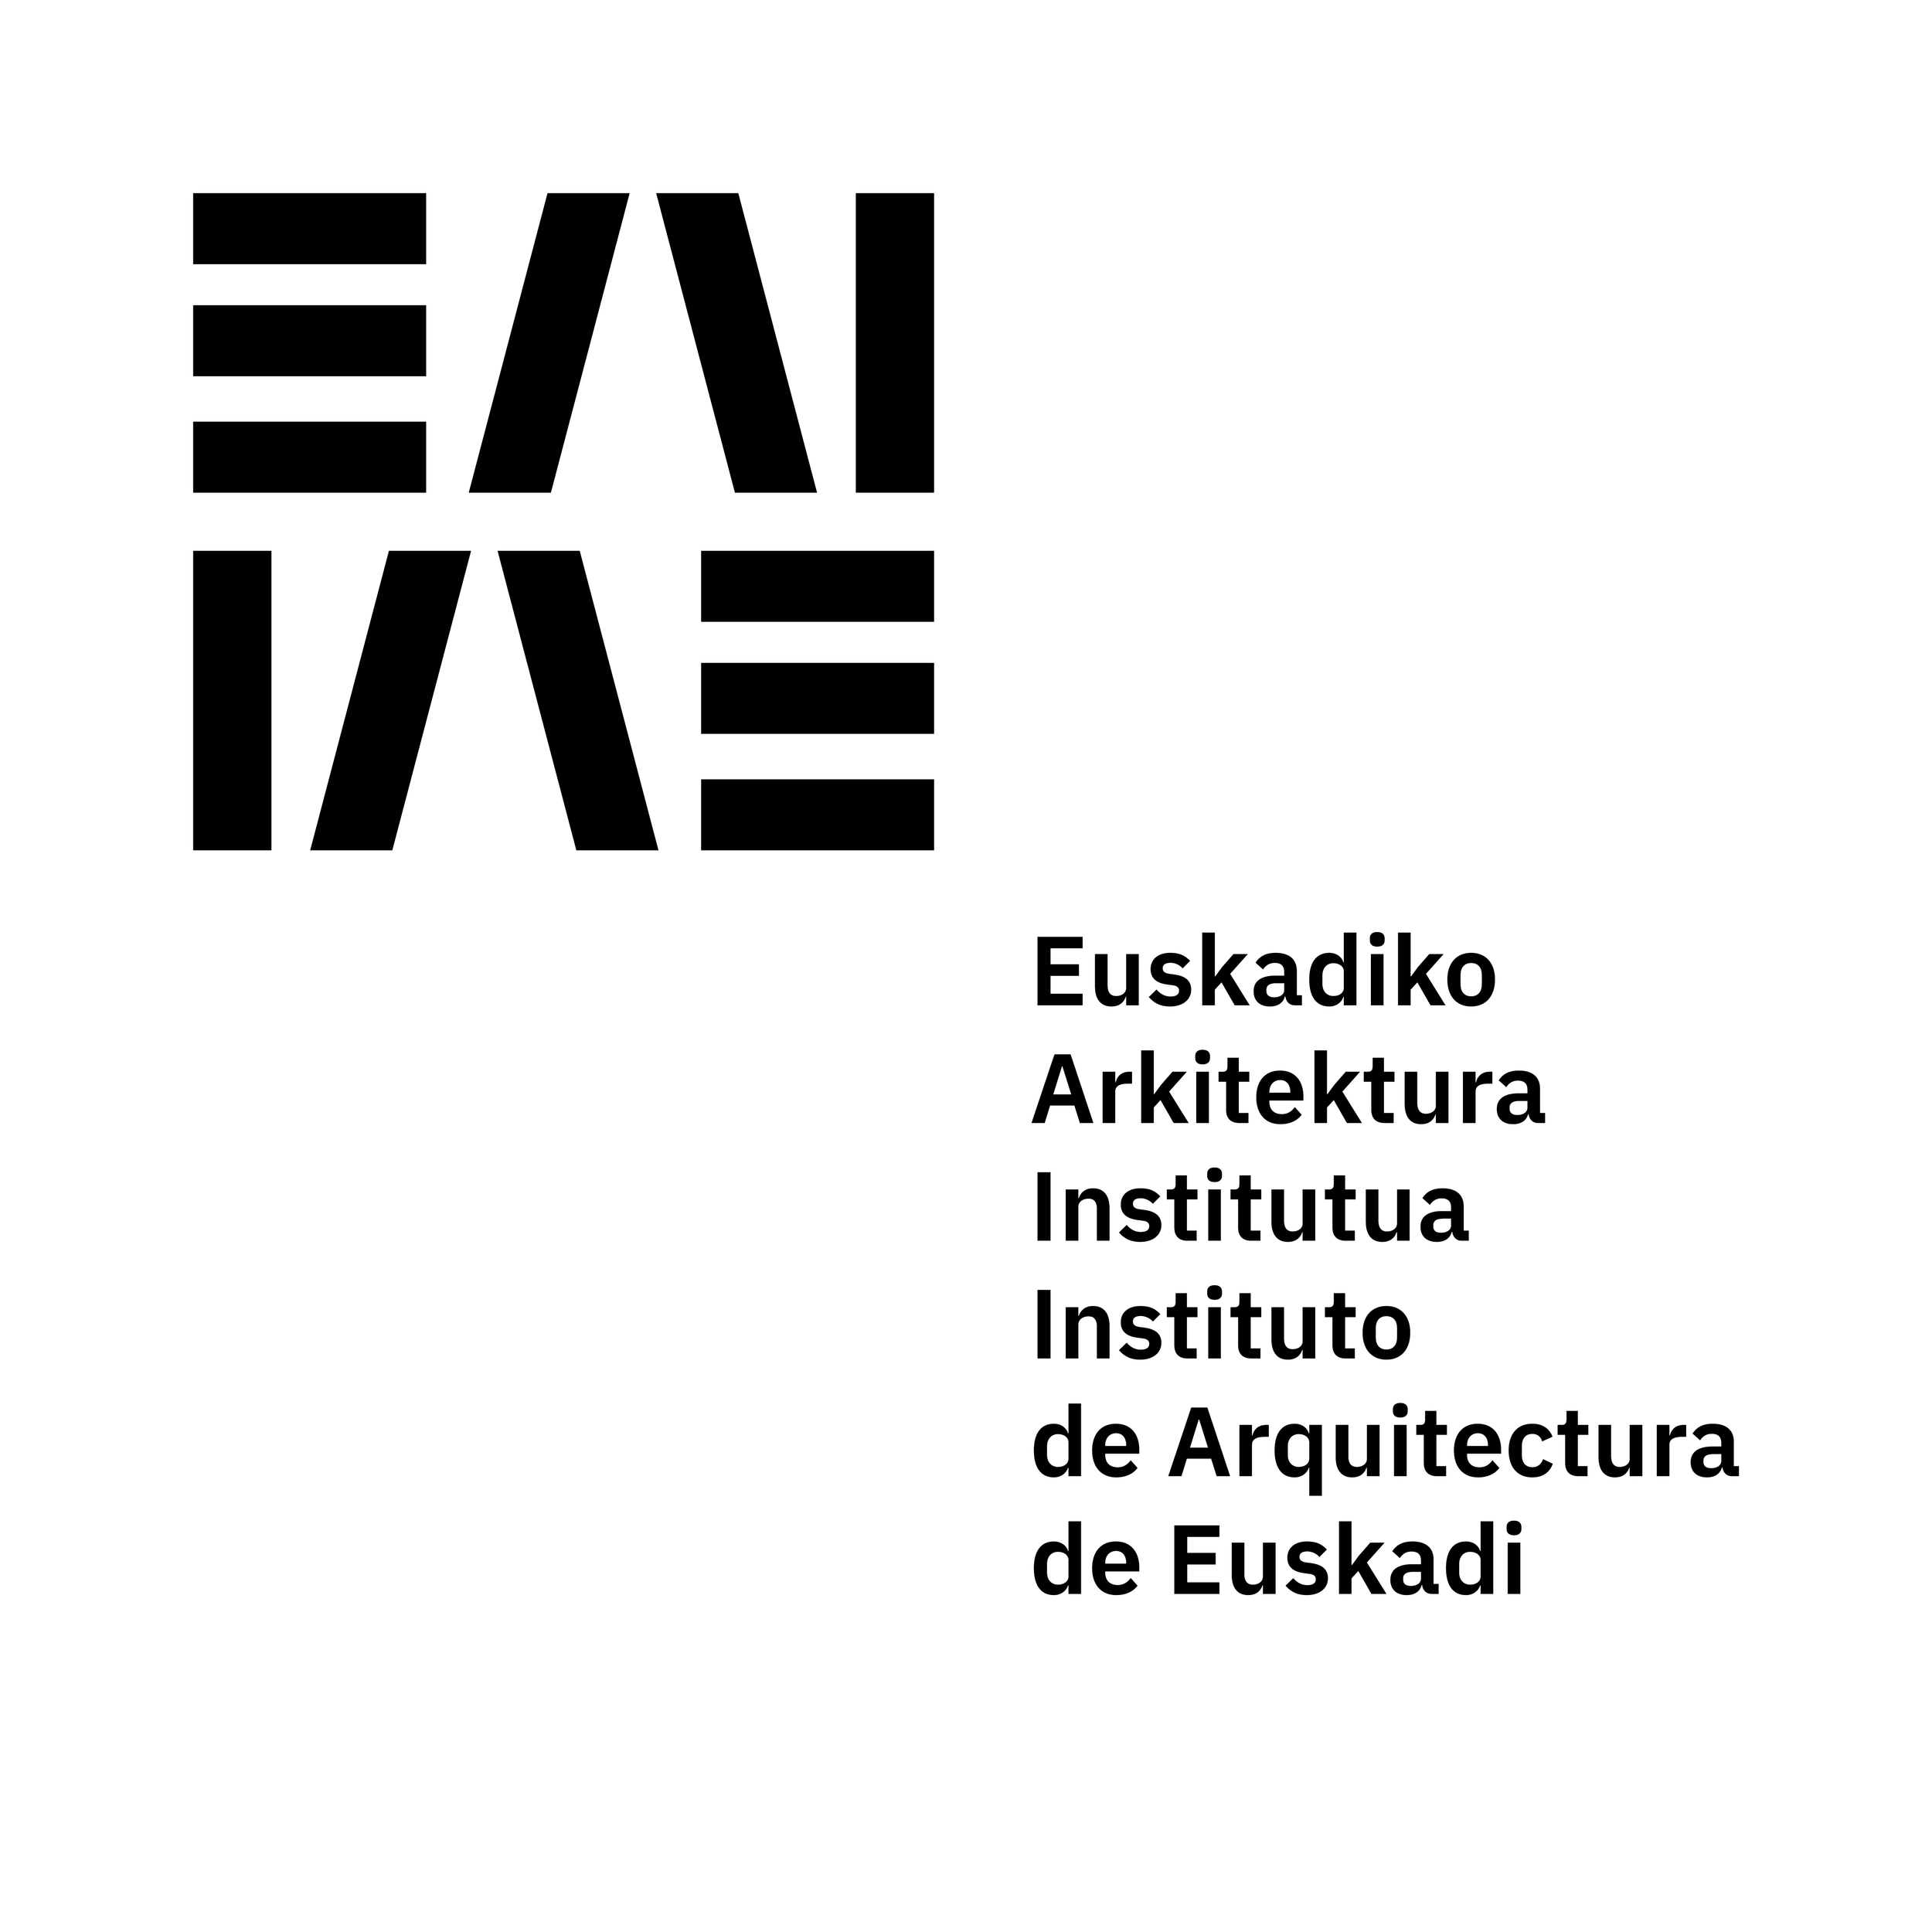 EAI_IAE_logo_4diagonal.png